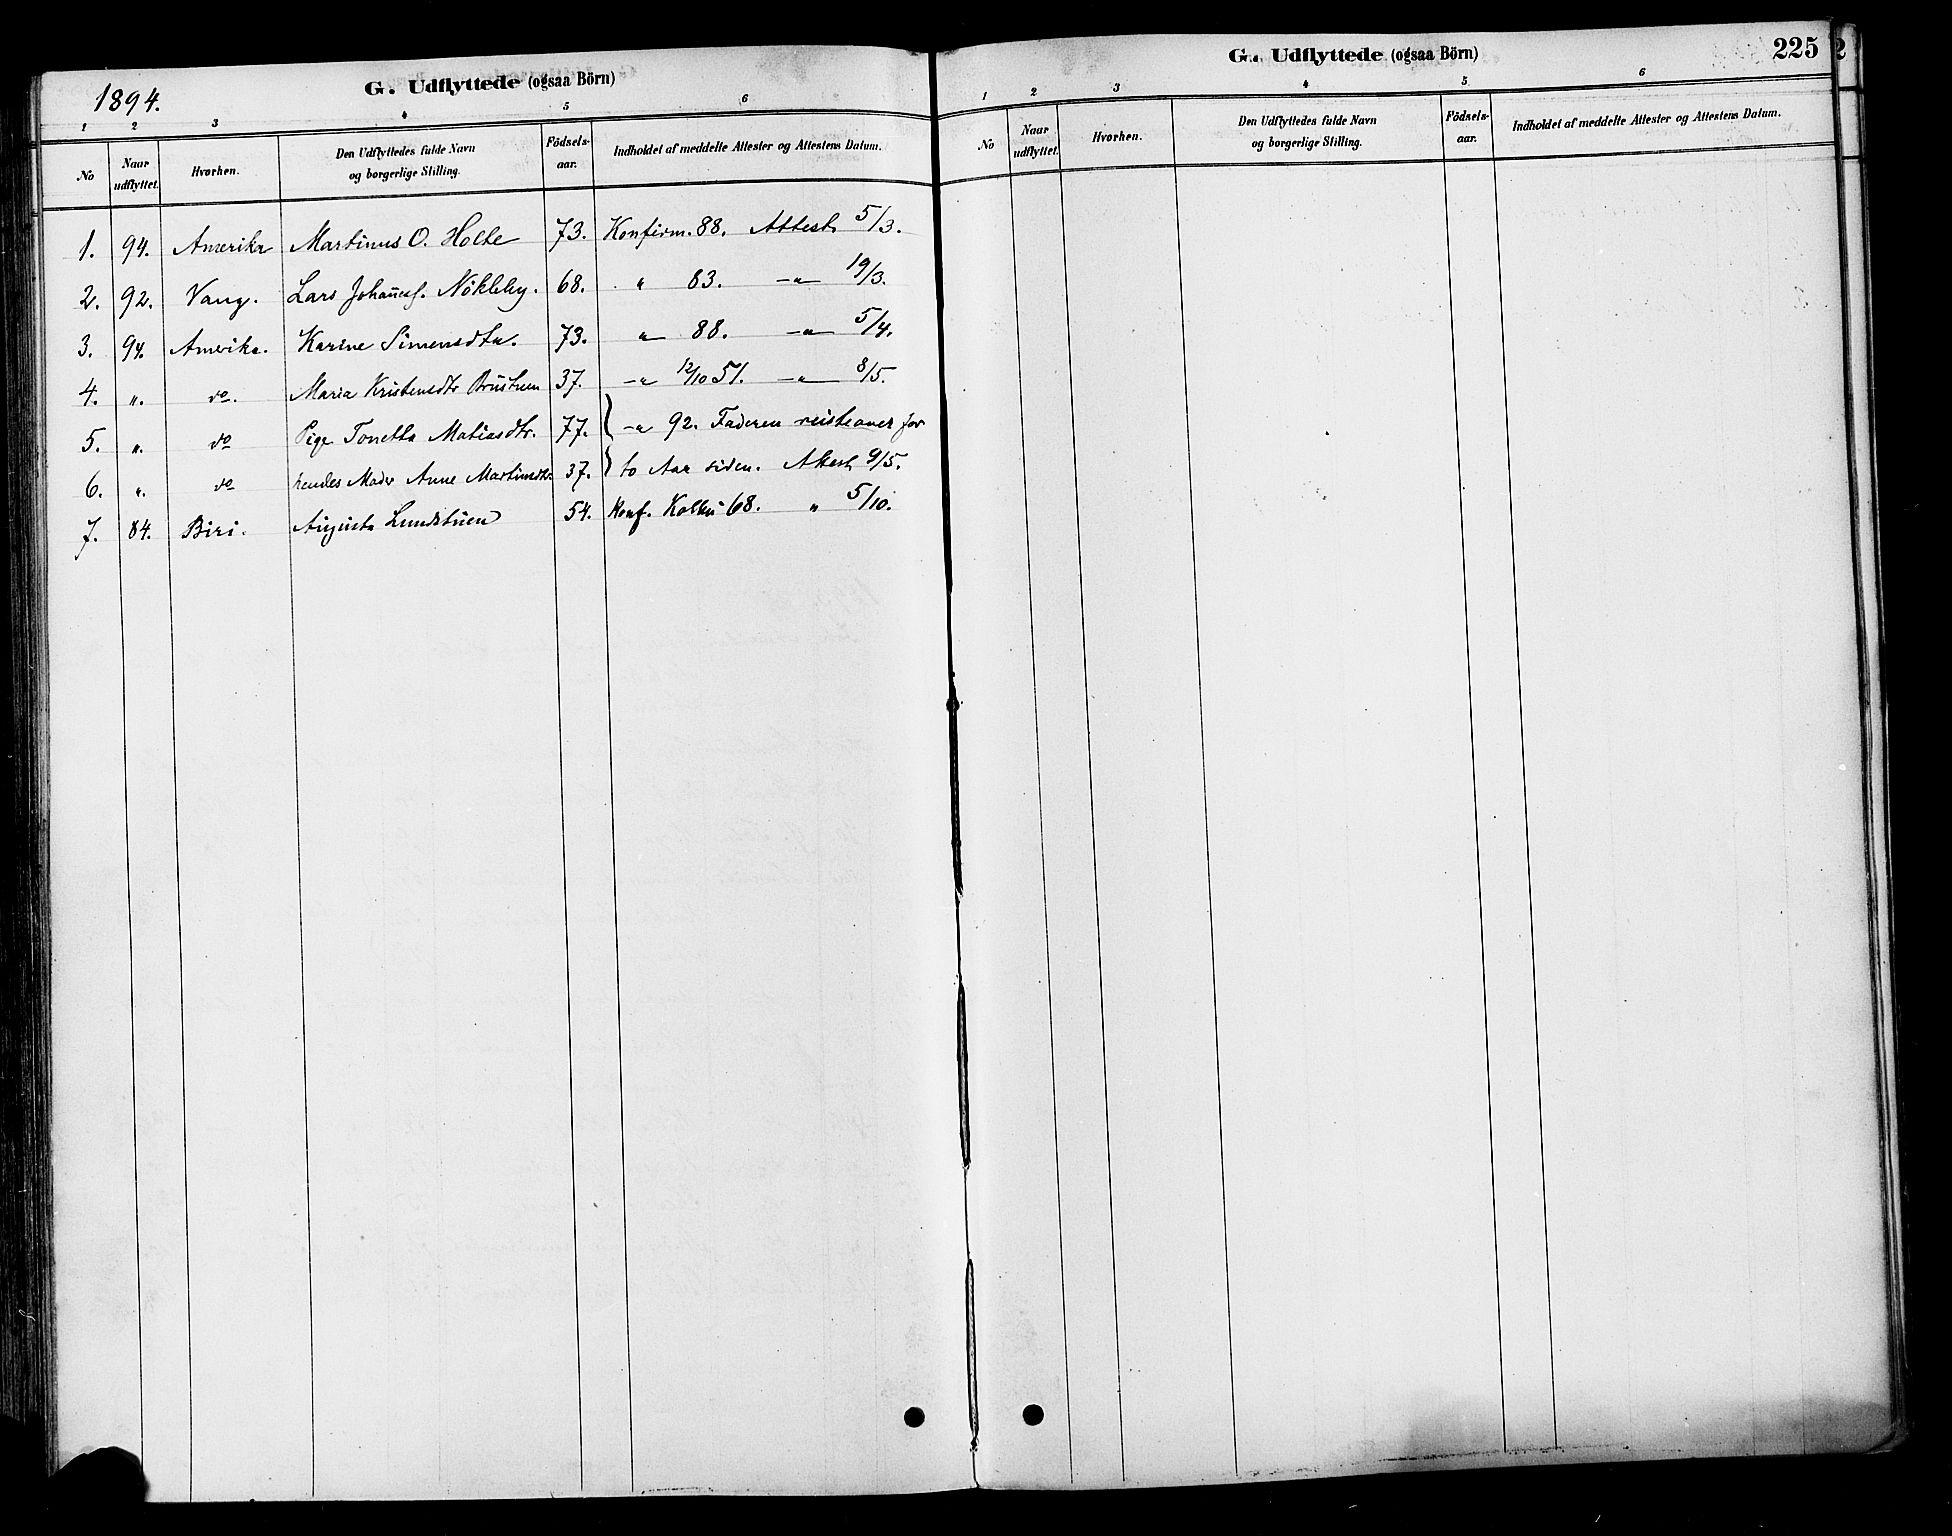 SAH, Vestre Toten prestekontor, H/Ha/Haa/L0010: Ministerialbok nr. 10, 1878-1894, s. 225